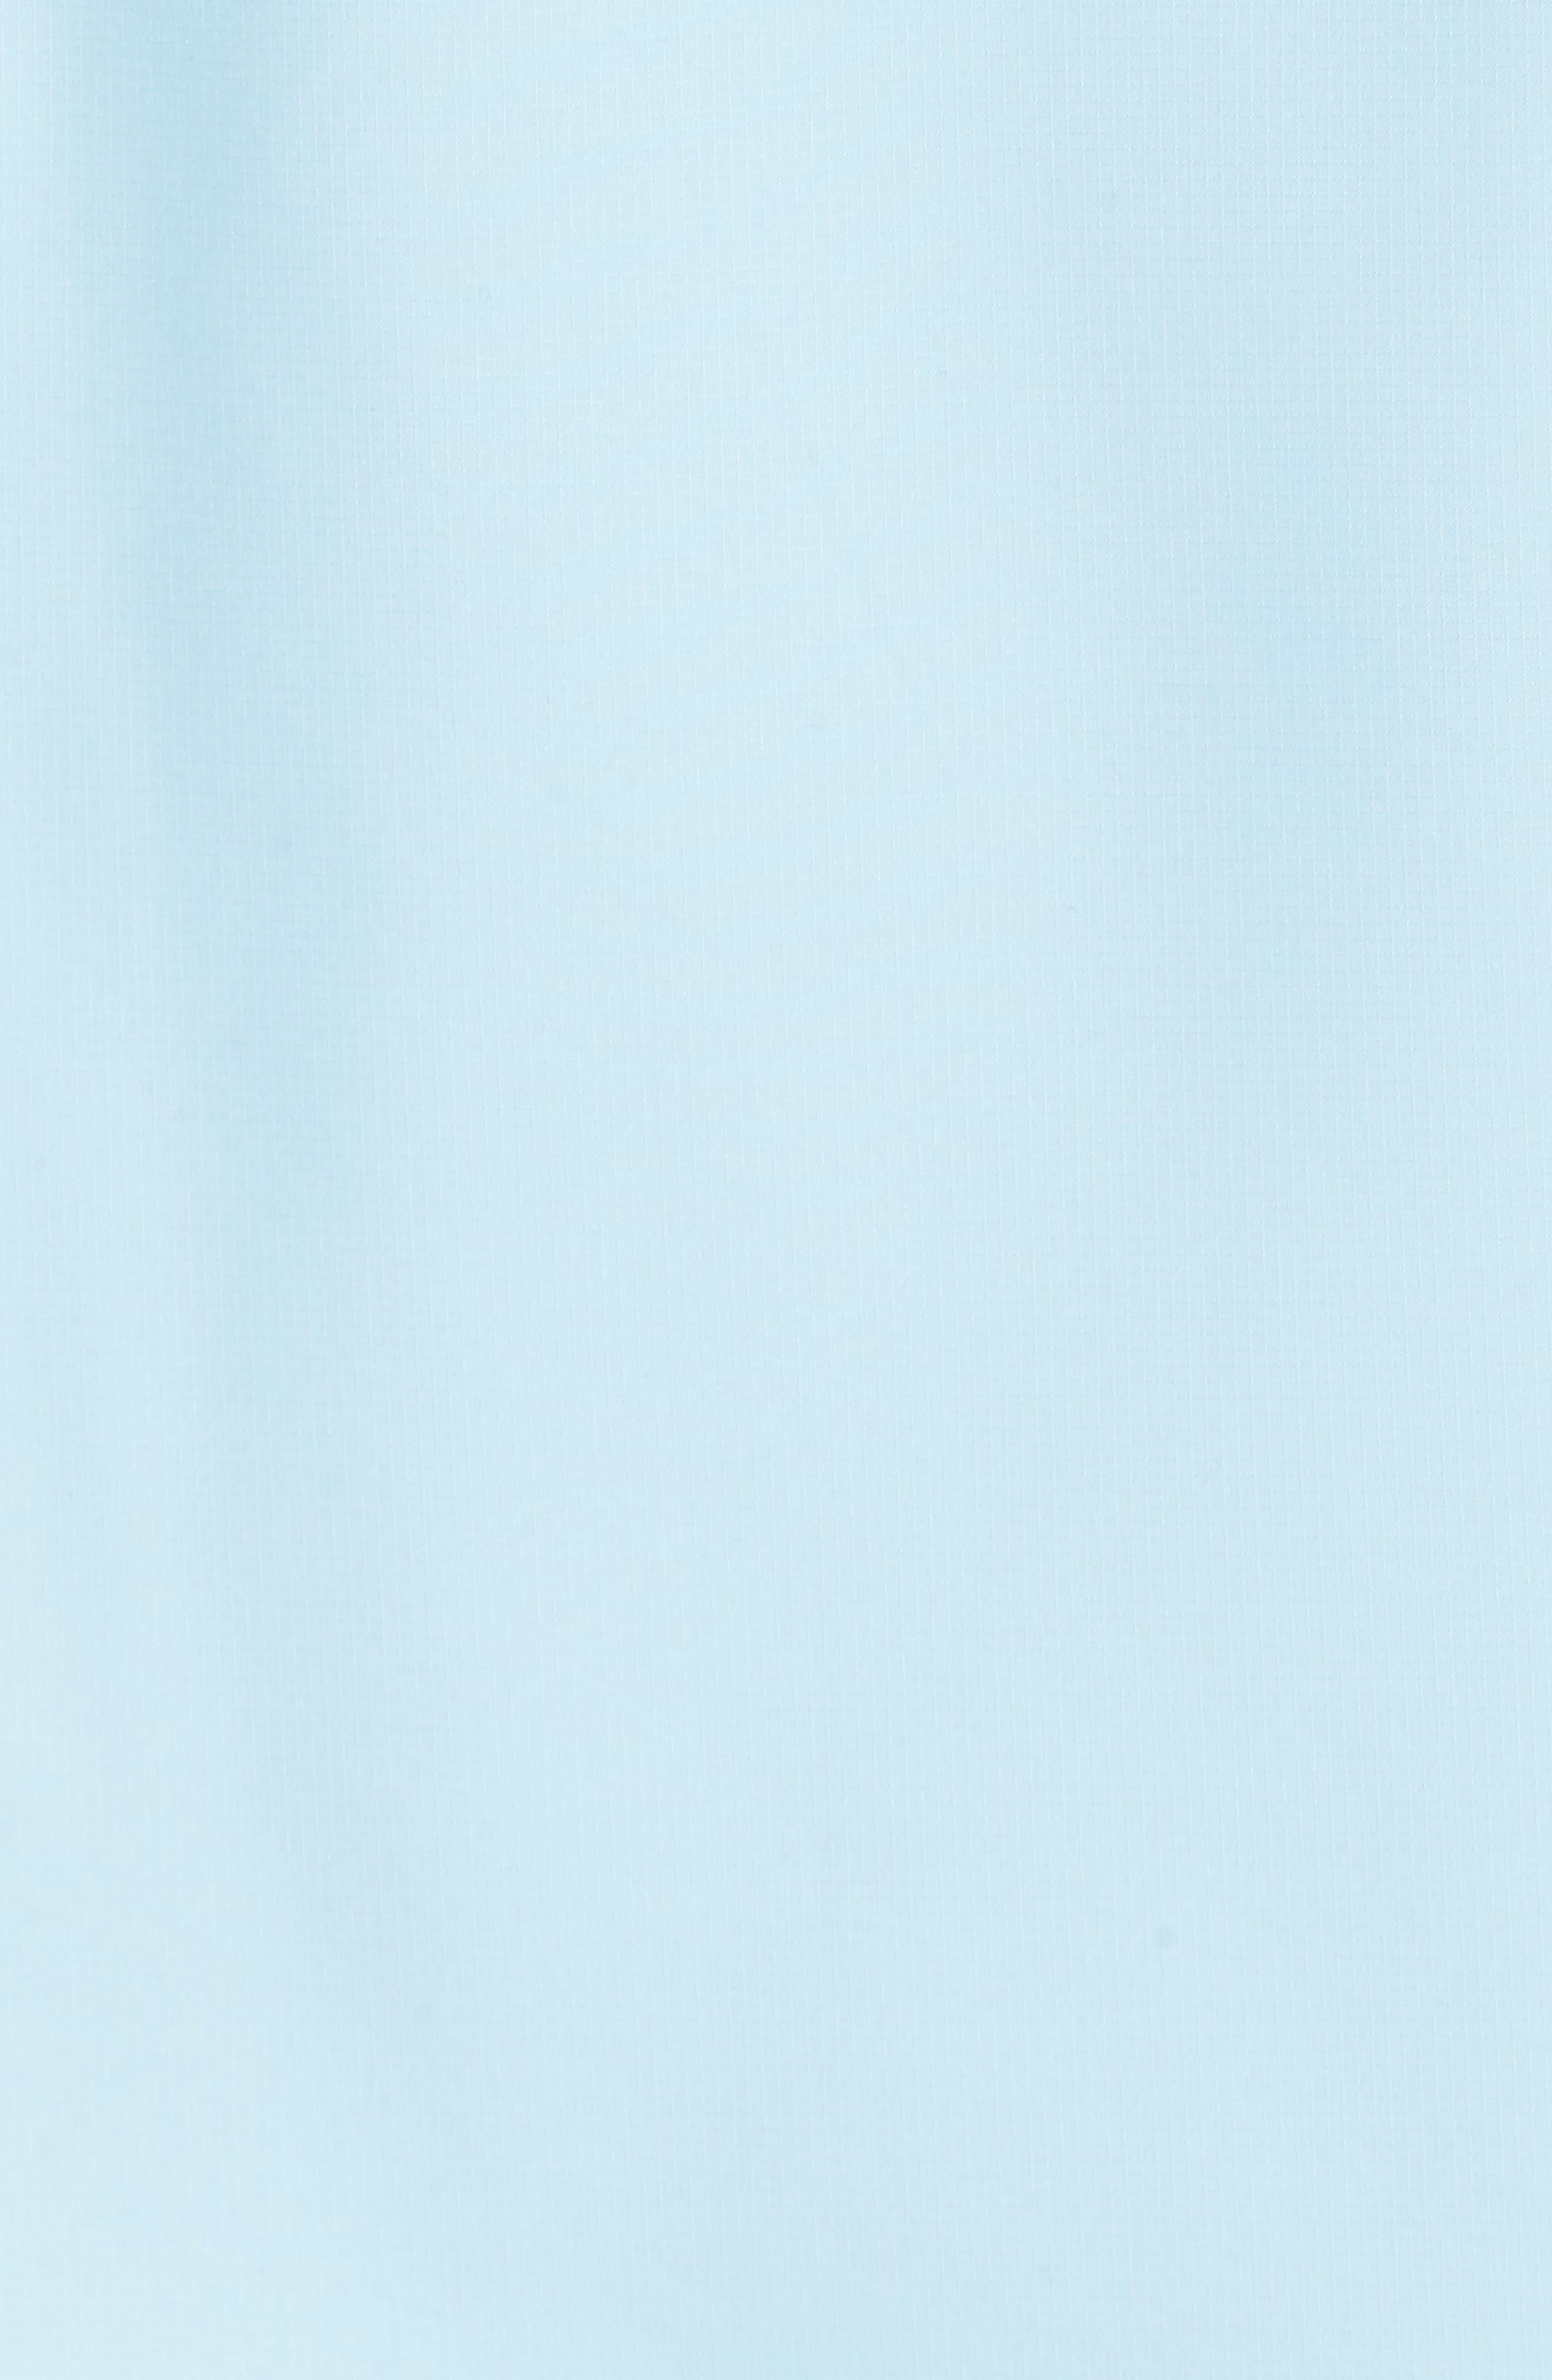 NIKE,                             Windrunner Colorblock Jacket,                             Alternate thumbnail 7, color,                             OCEAN BLISS/ AEGEAN STORM